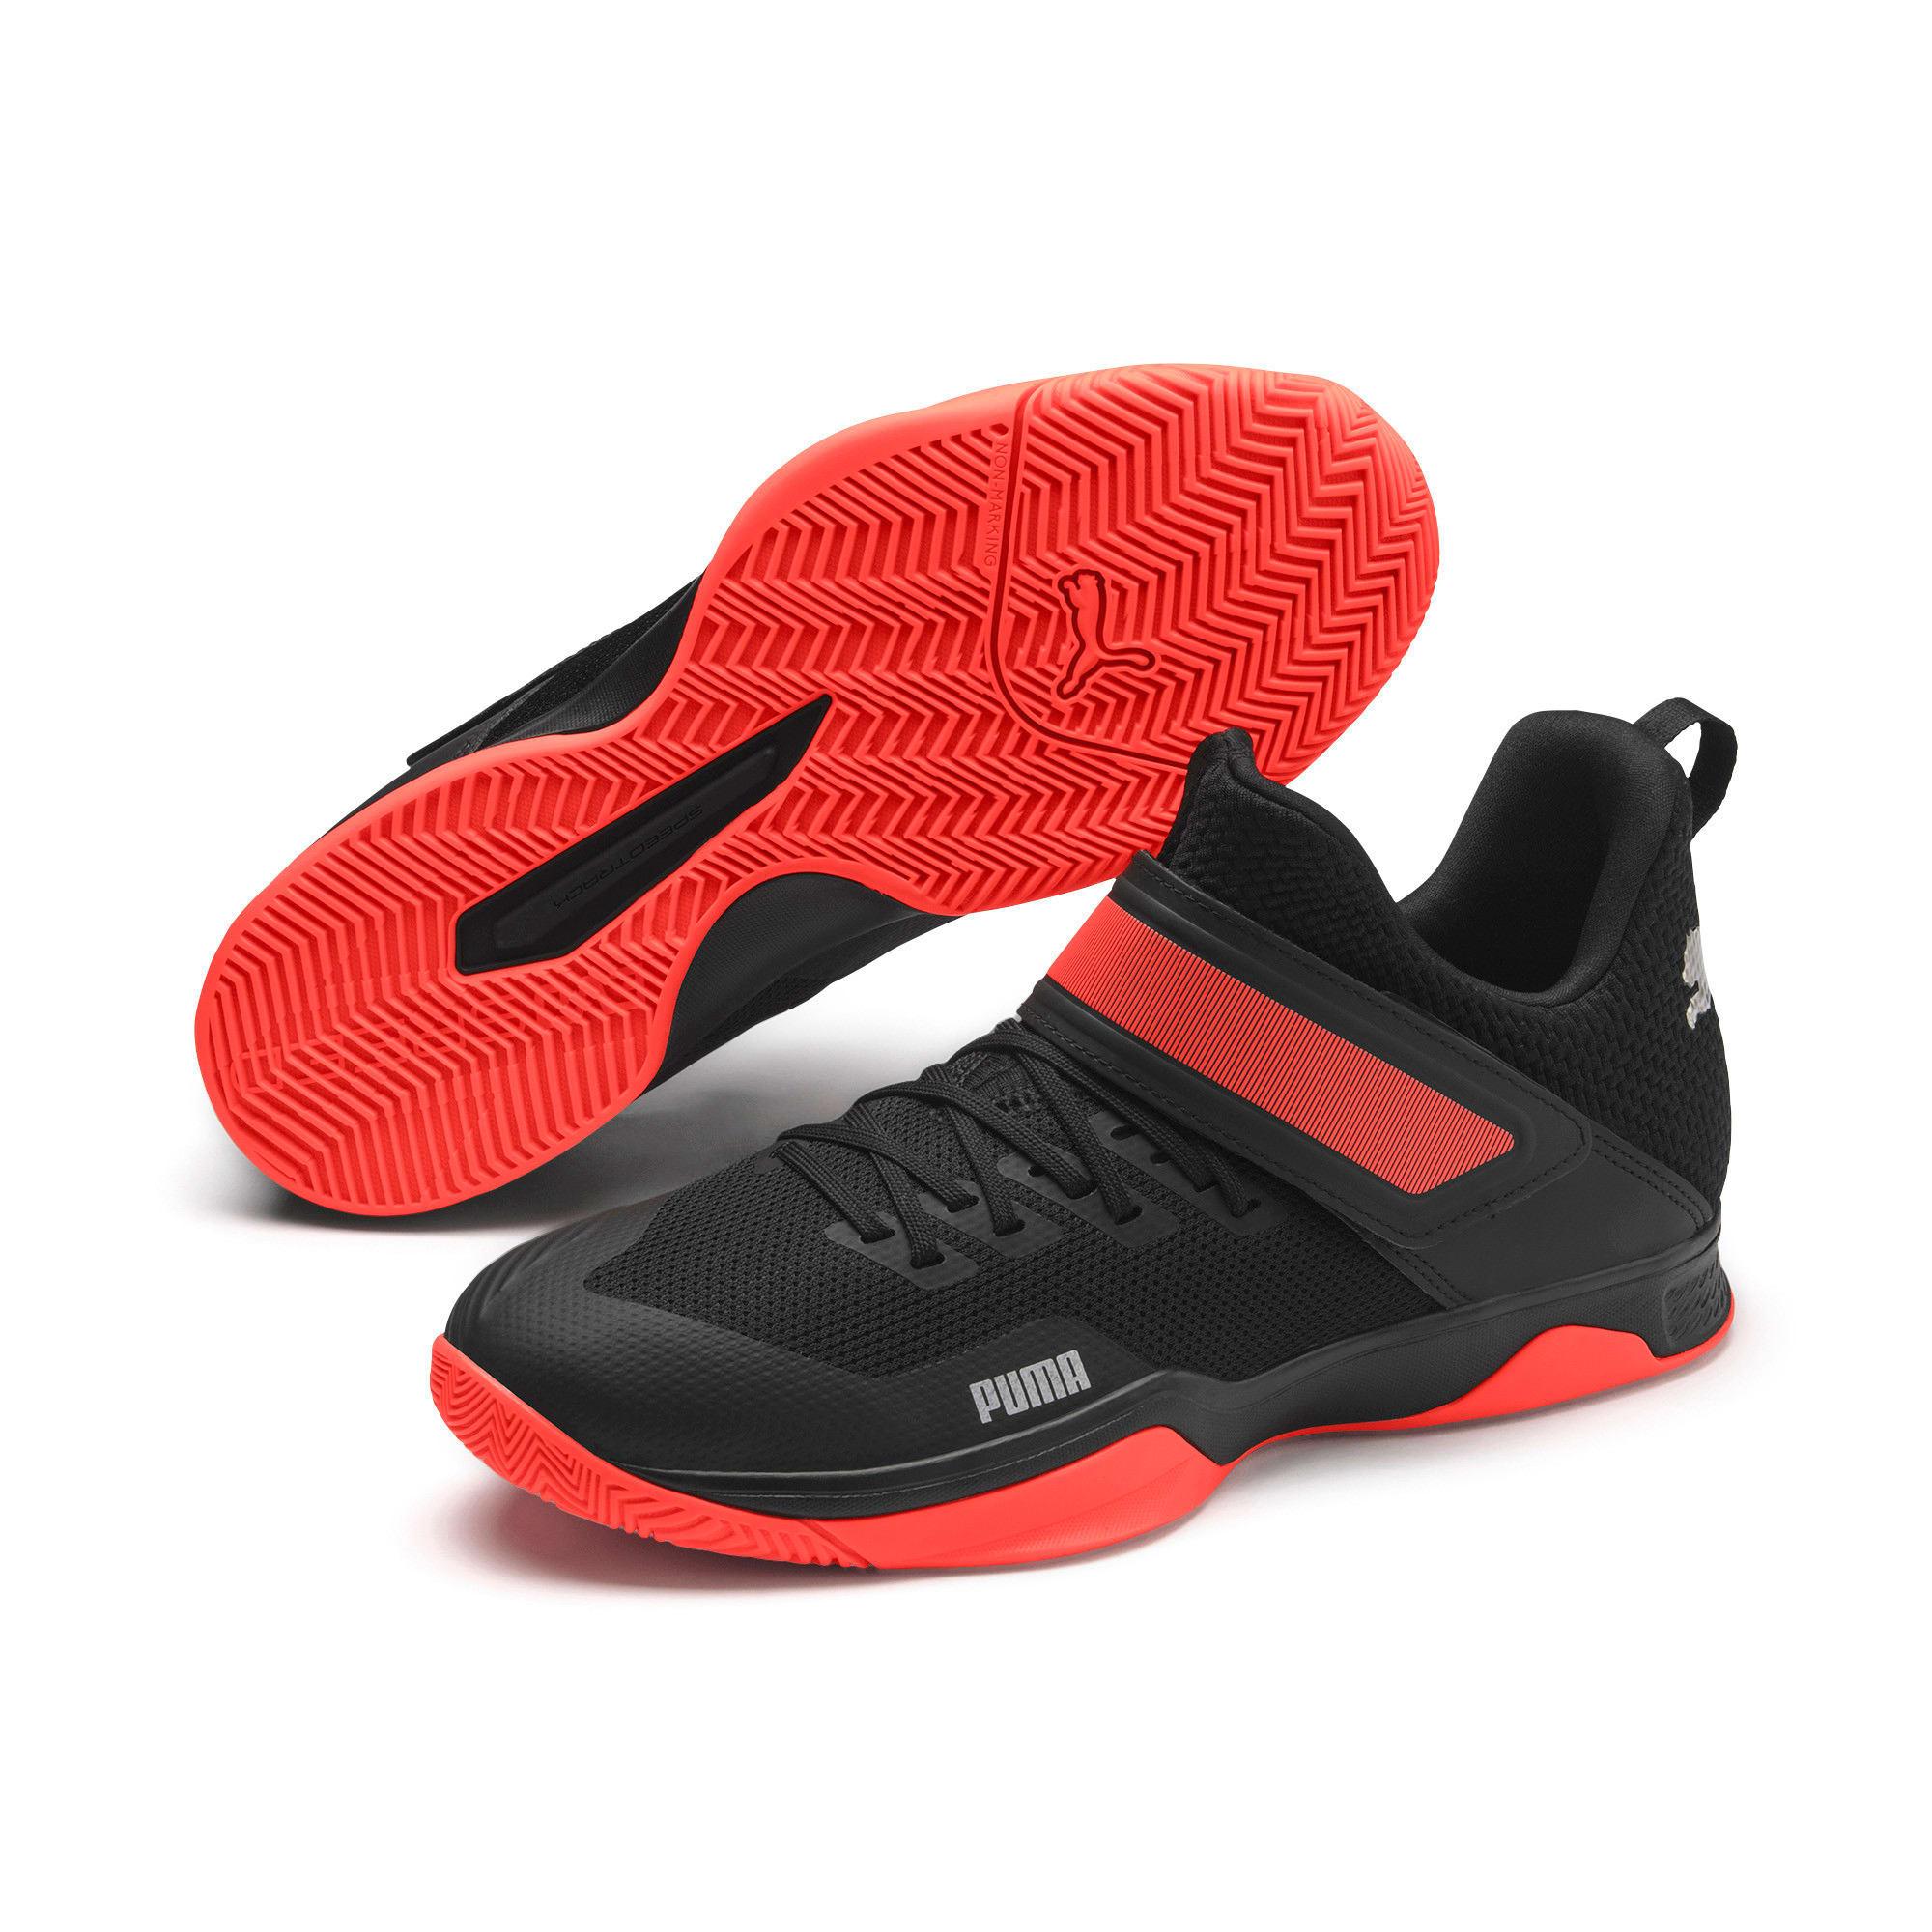 Thumbnail 3 of Chaussures Handball Rise XT3, Puma Black-Silver-Nrgy Red, medium